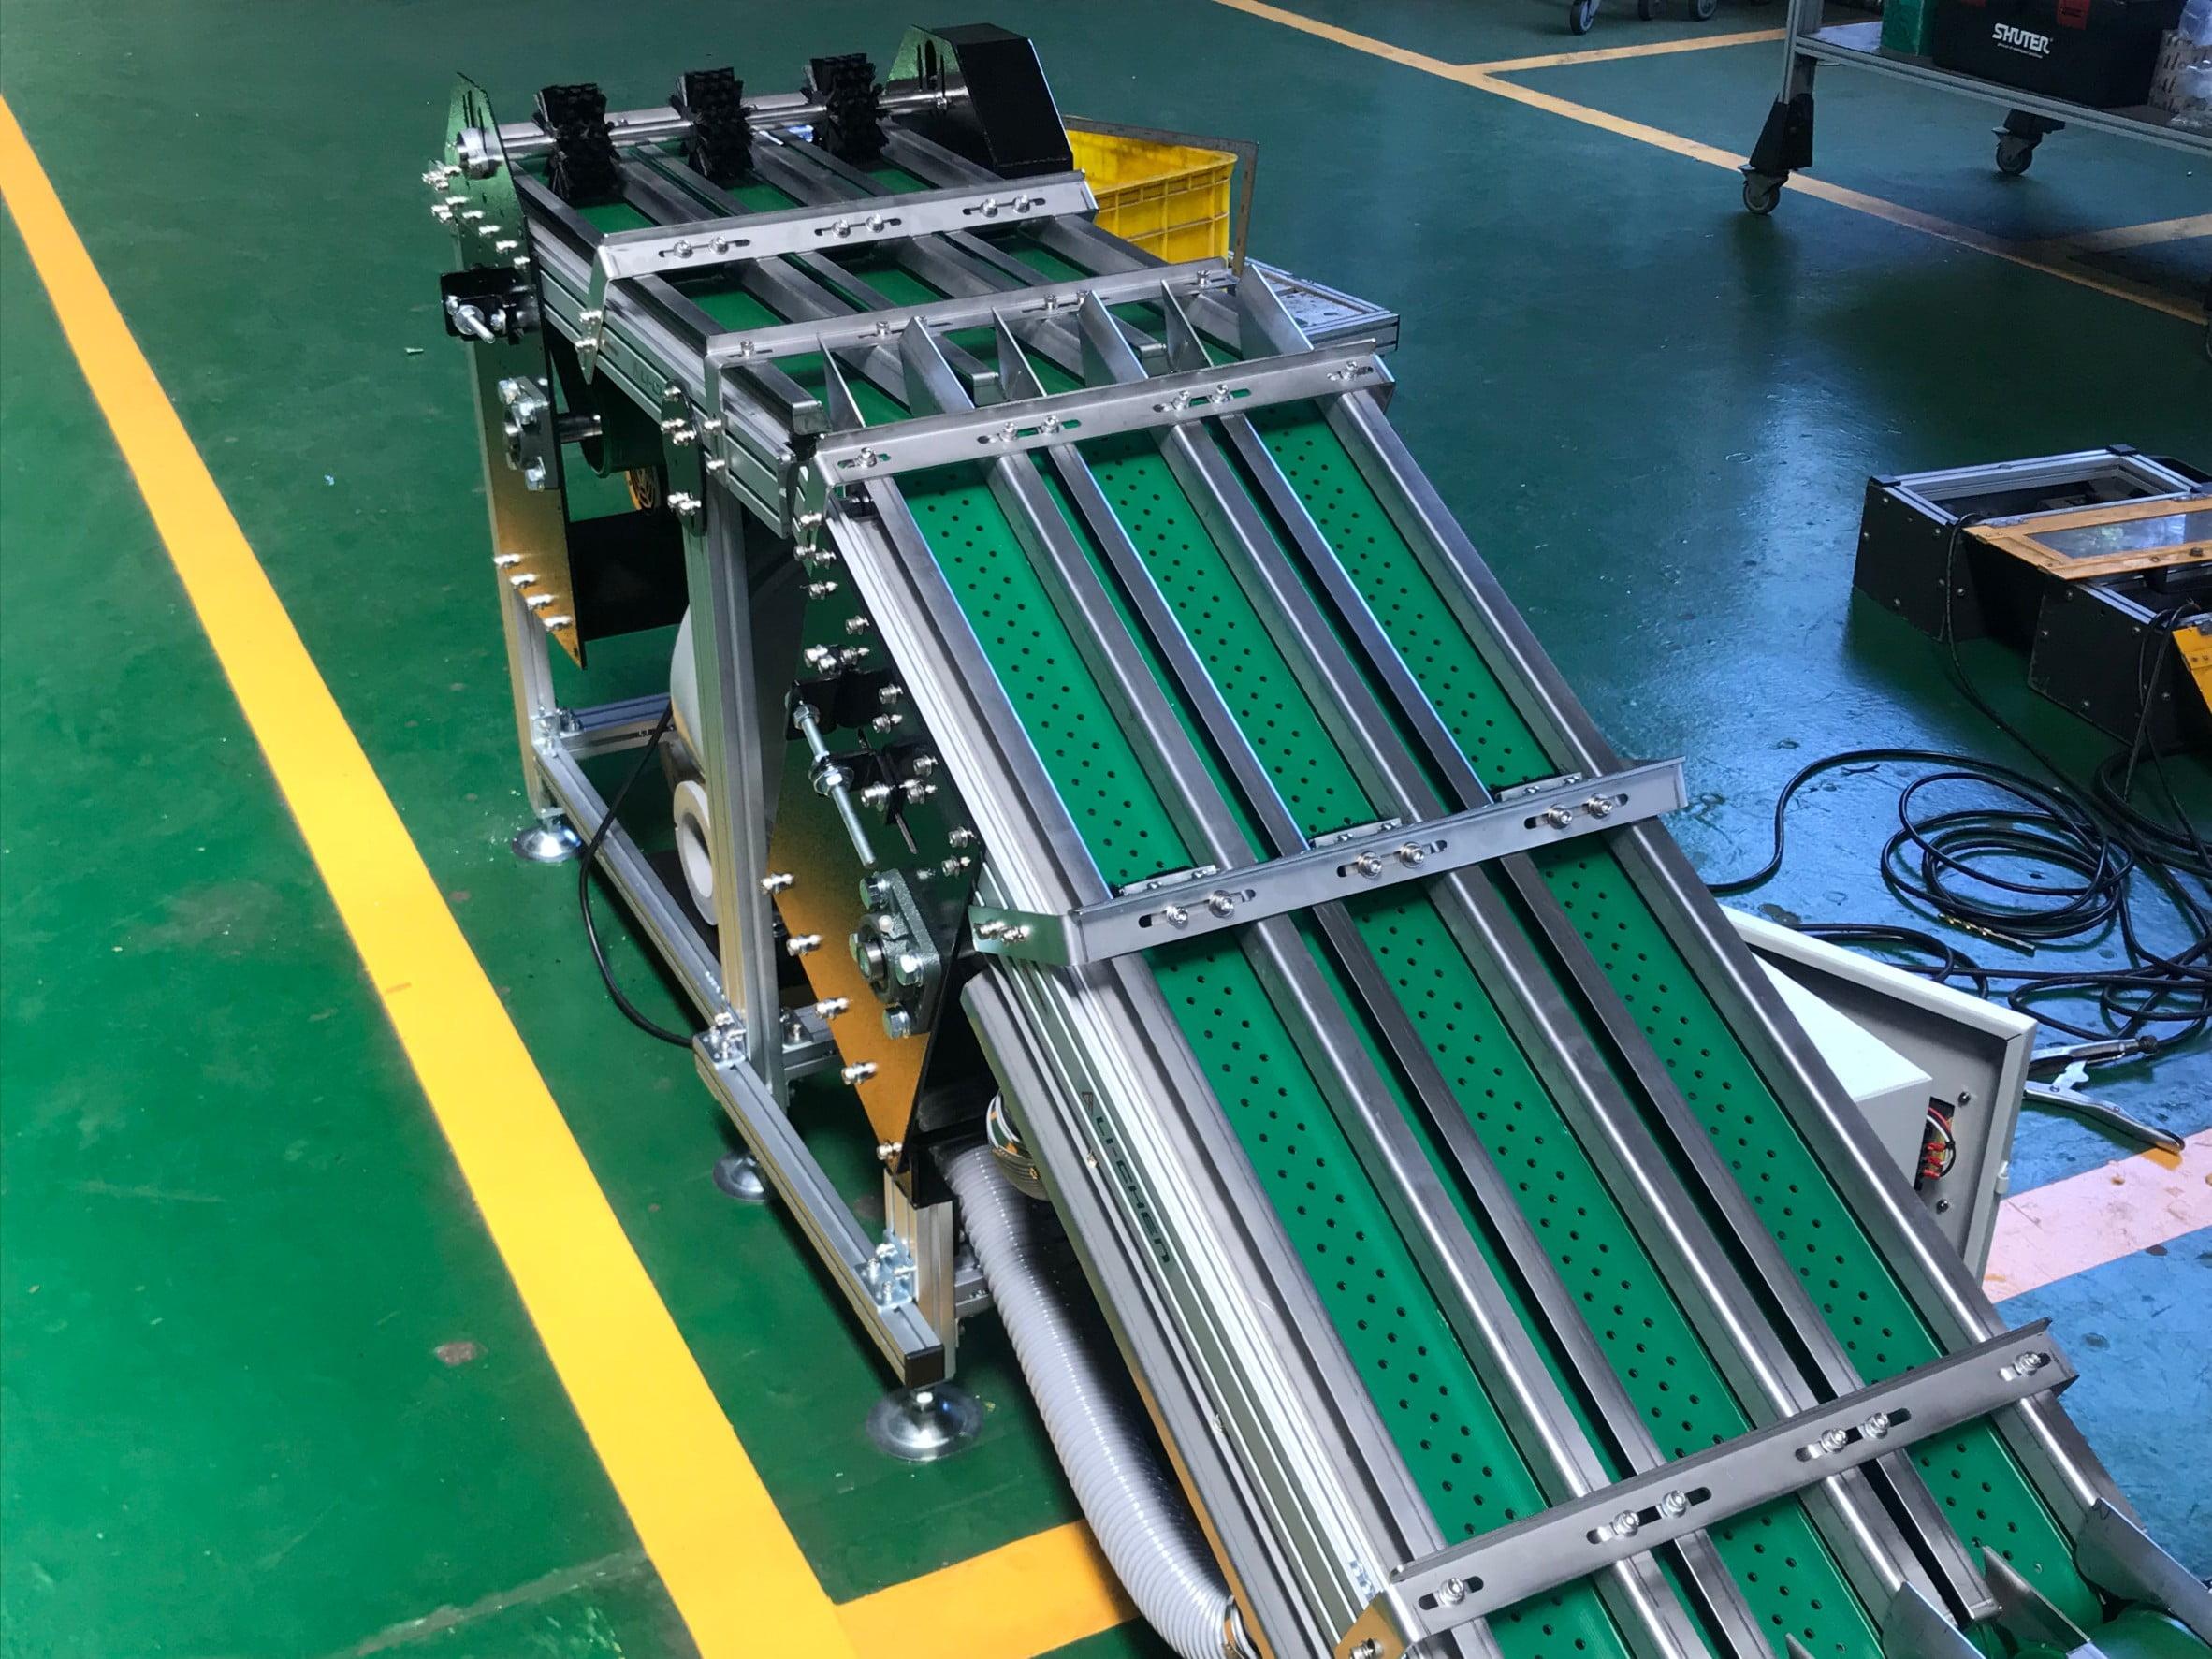 AAluminum Extruded Belt shunt Suction Conveyor -Lichen Conveyor Equipment Co., Ltd.